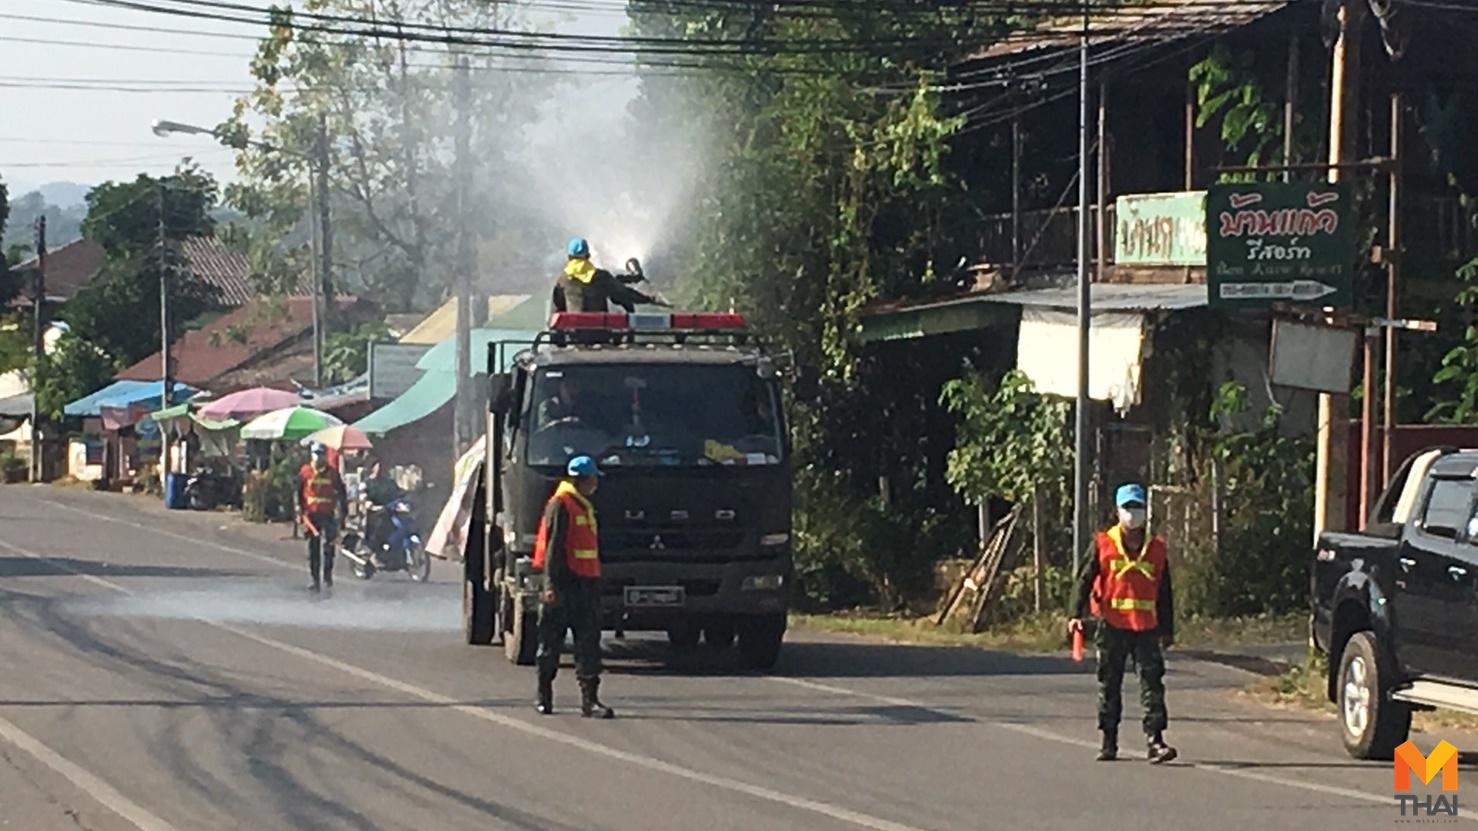 PM 2.5 ข่าวภูมิภาค ฝุ่นละออง สถานการณ์ฝุ่น แม่ฮ่องสอน